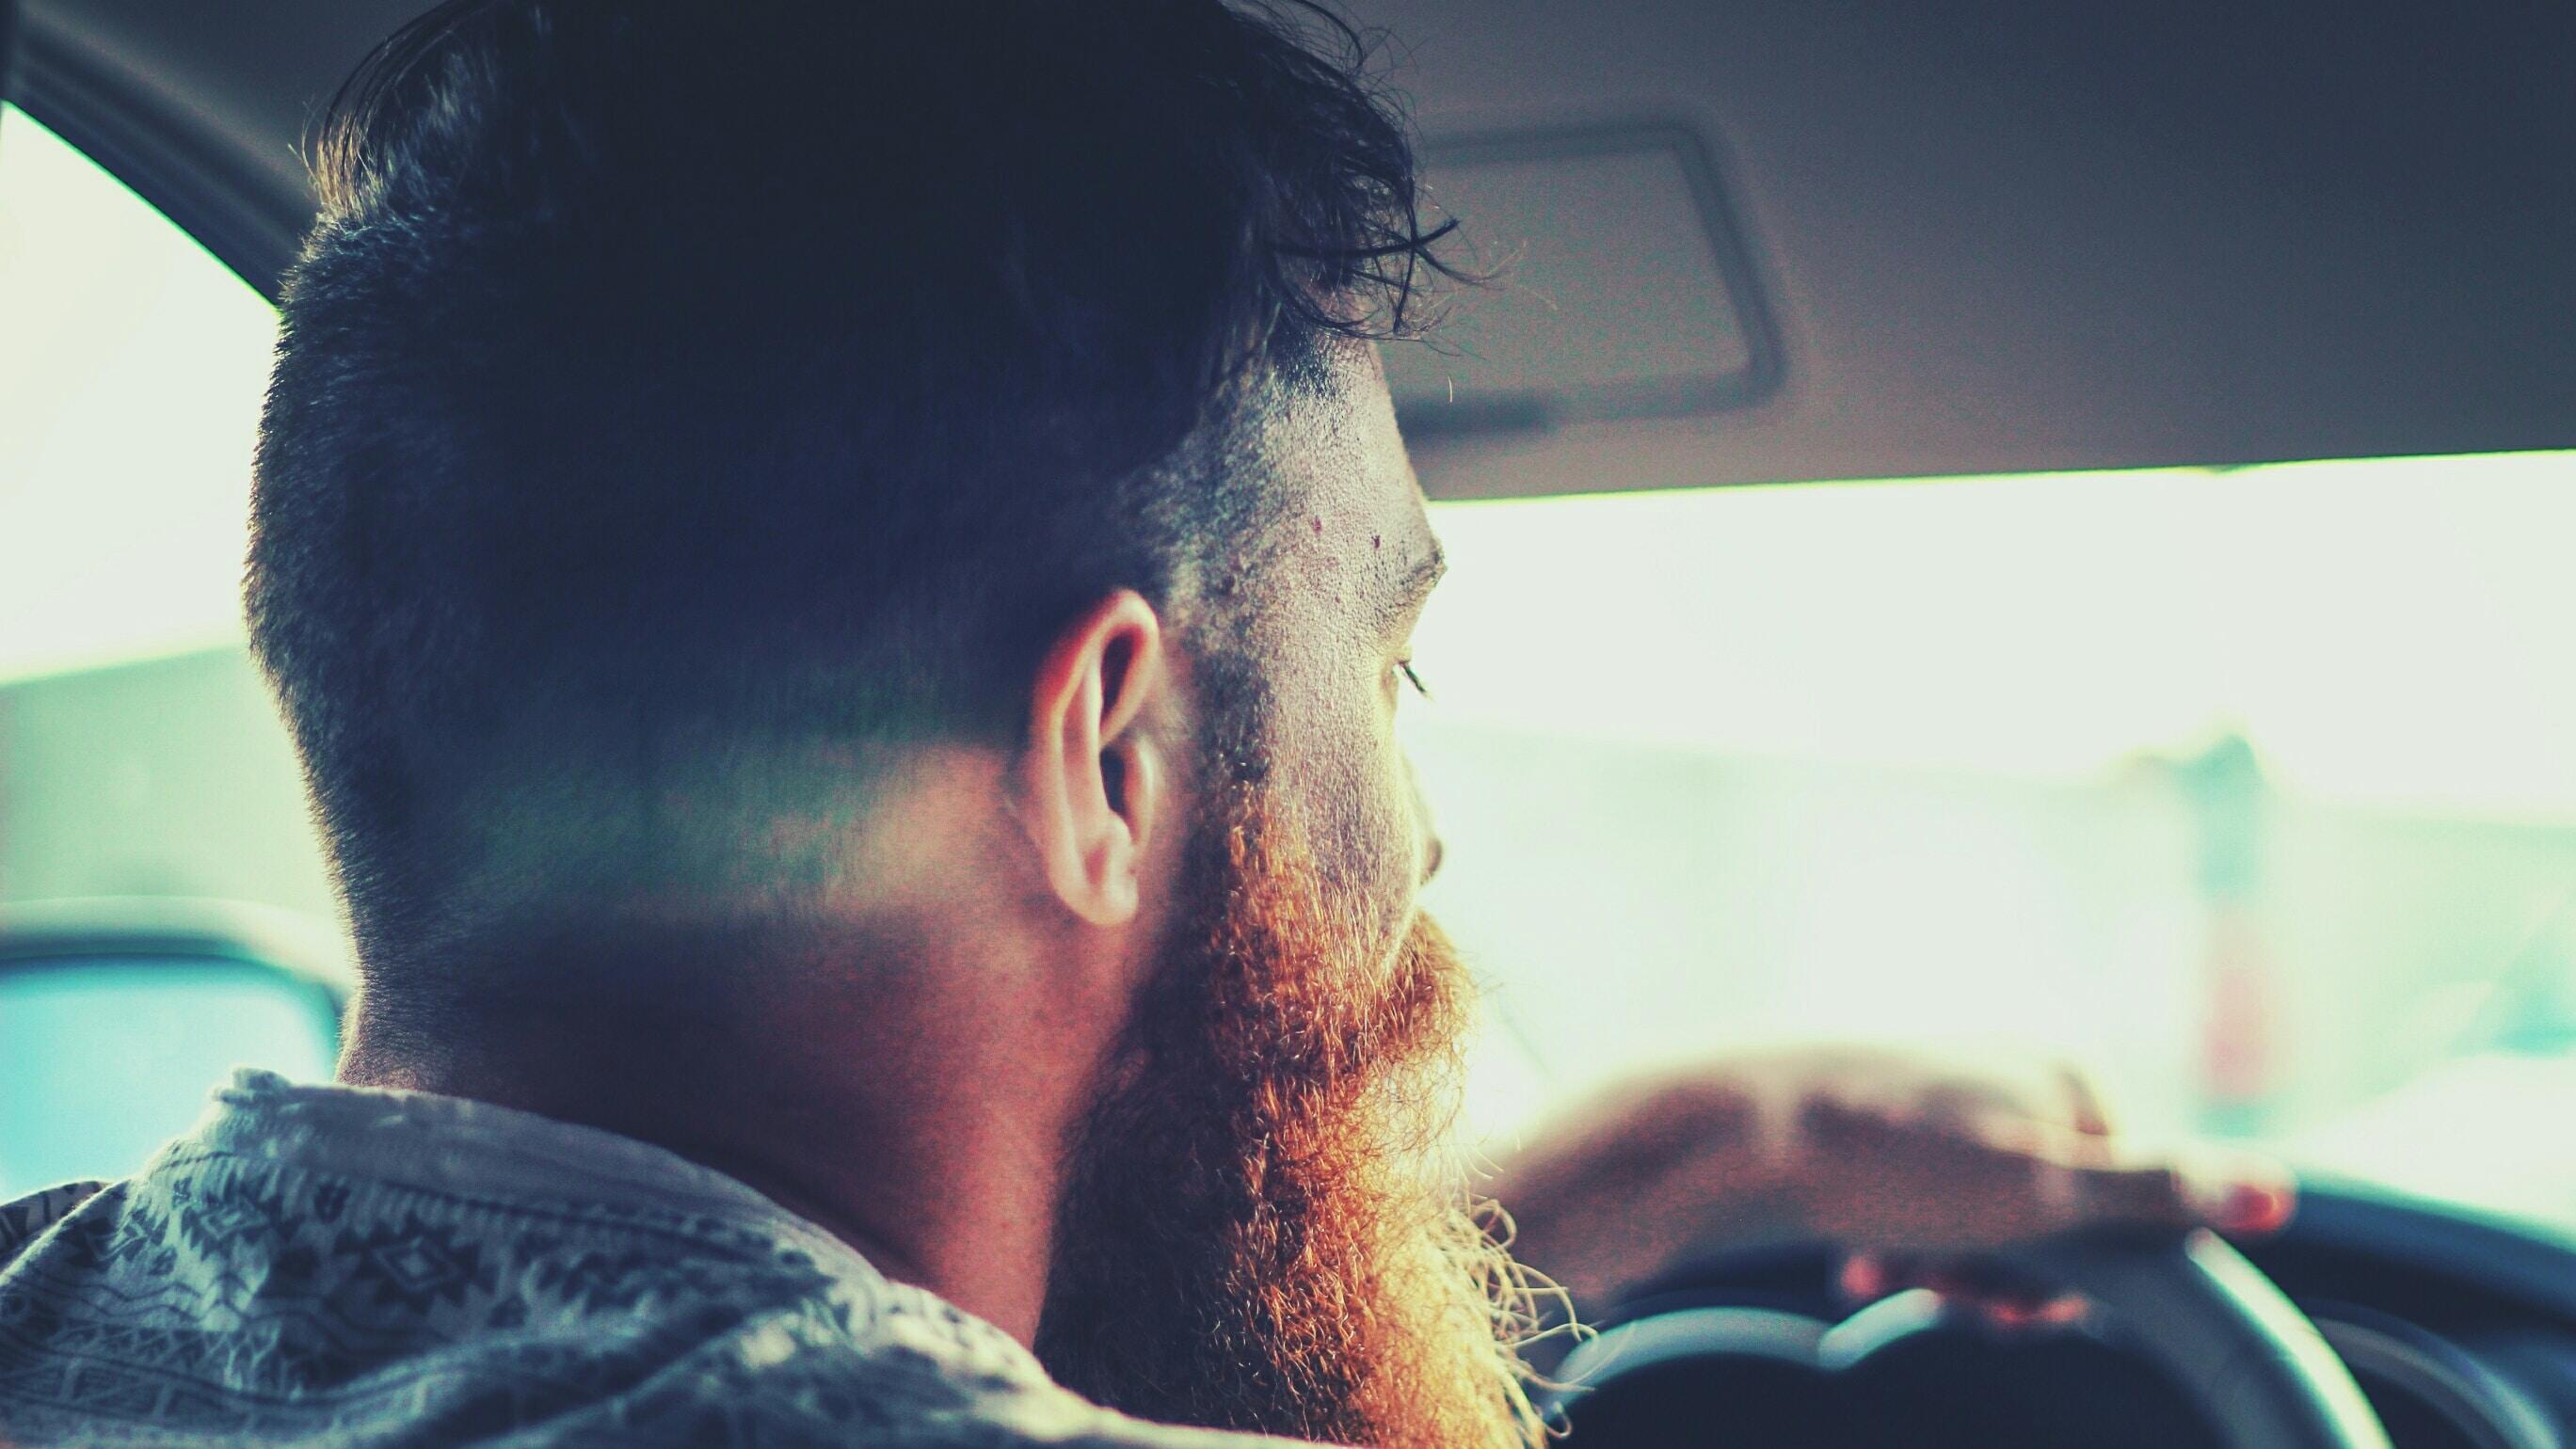 A man with a beard drives a car in Las Vegas